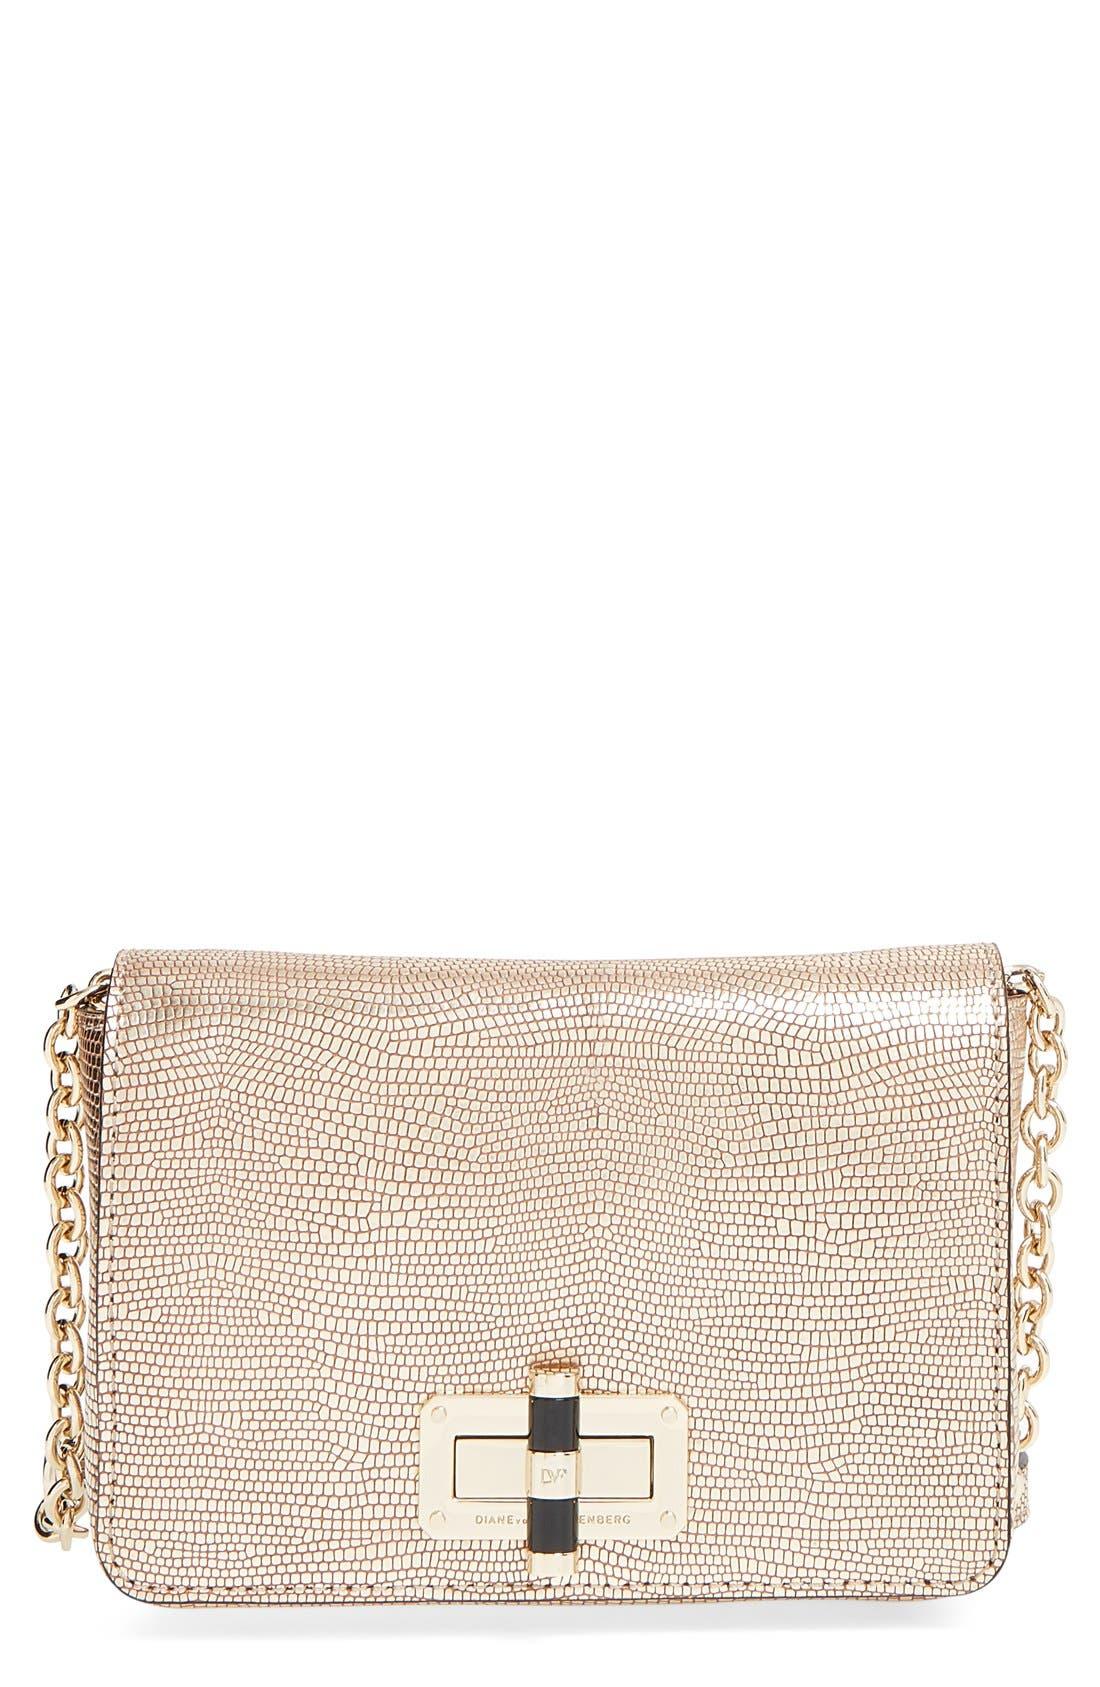 Main Image - Diane von Furstenberg '440 Gallery Bellini' Crossbody Bag